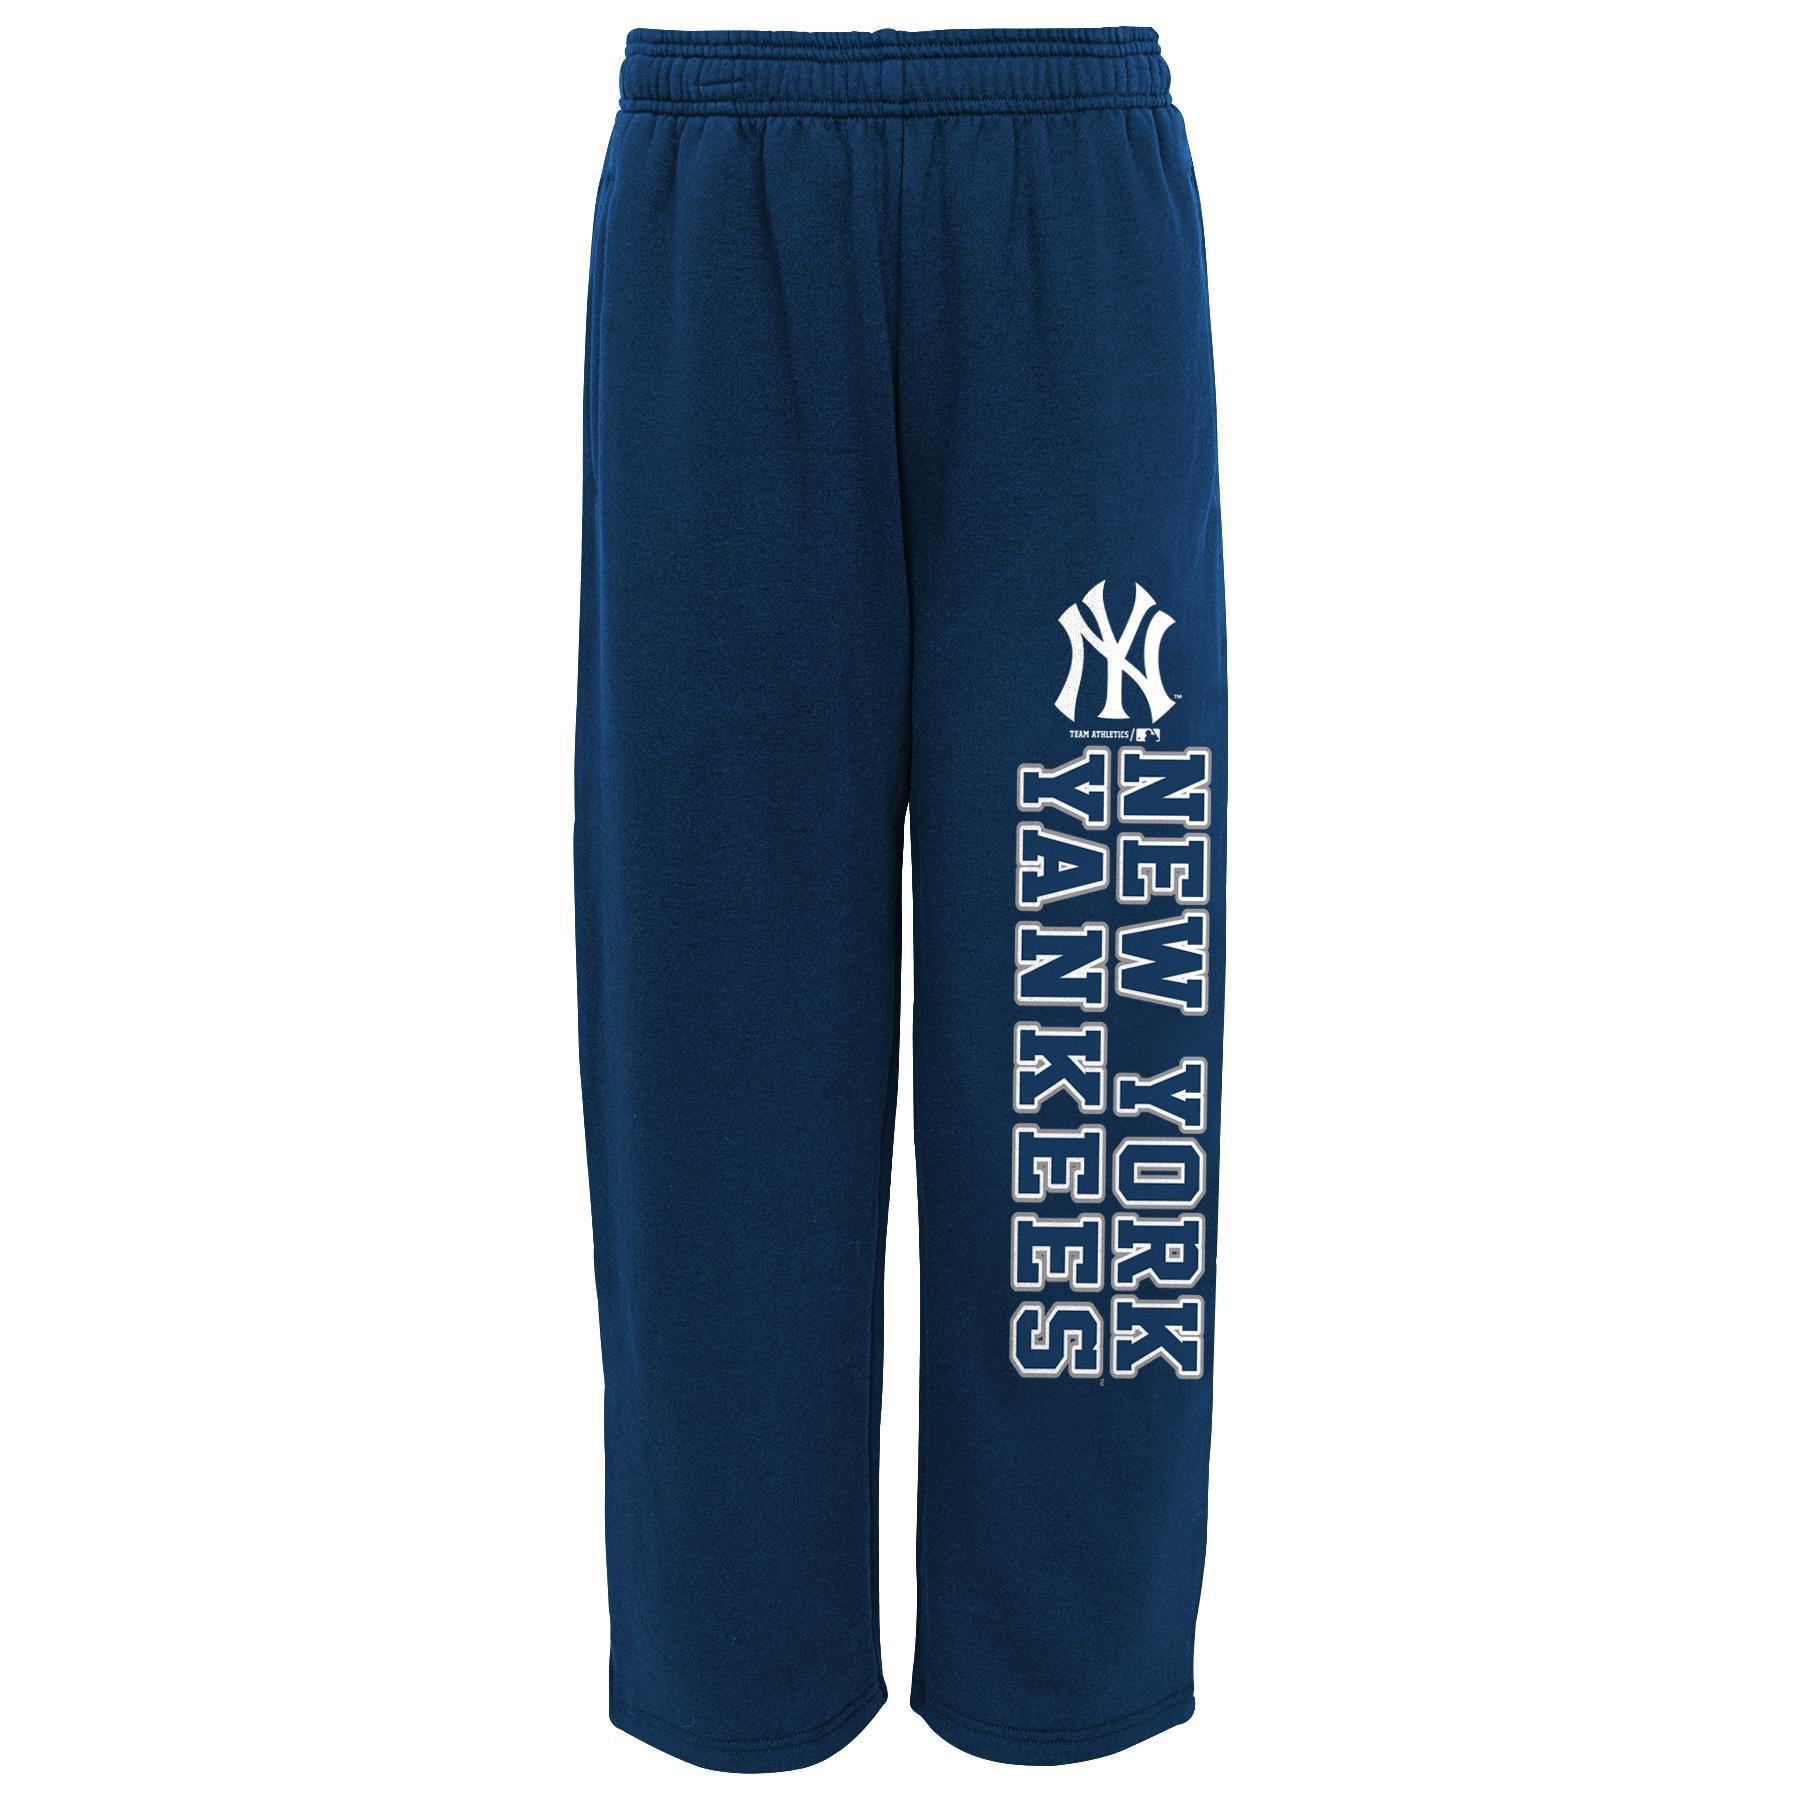 MLB Boys' Sweatpants - New York Yankees PartNumber: 046VA93299812P MfgPartNumber: 38DOZ-16